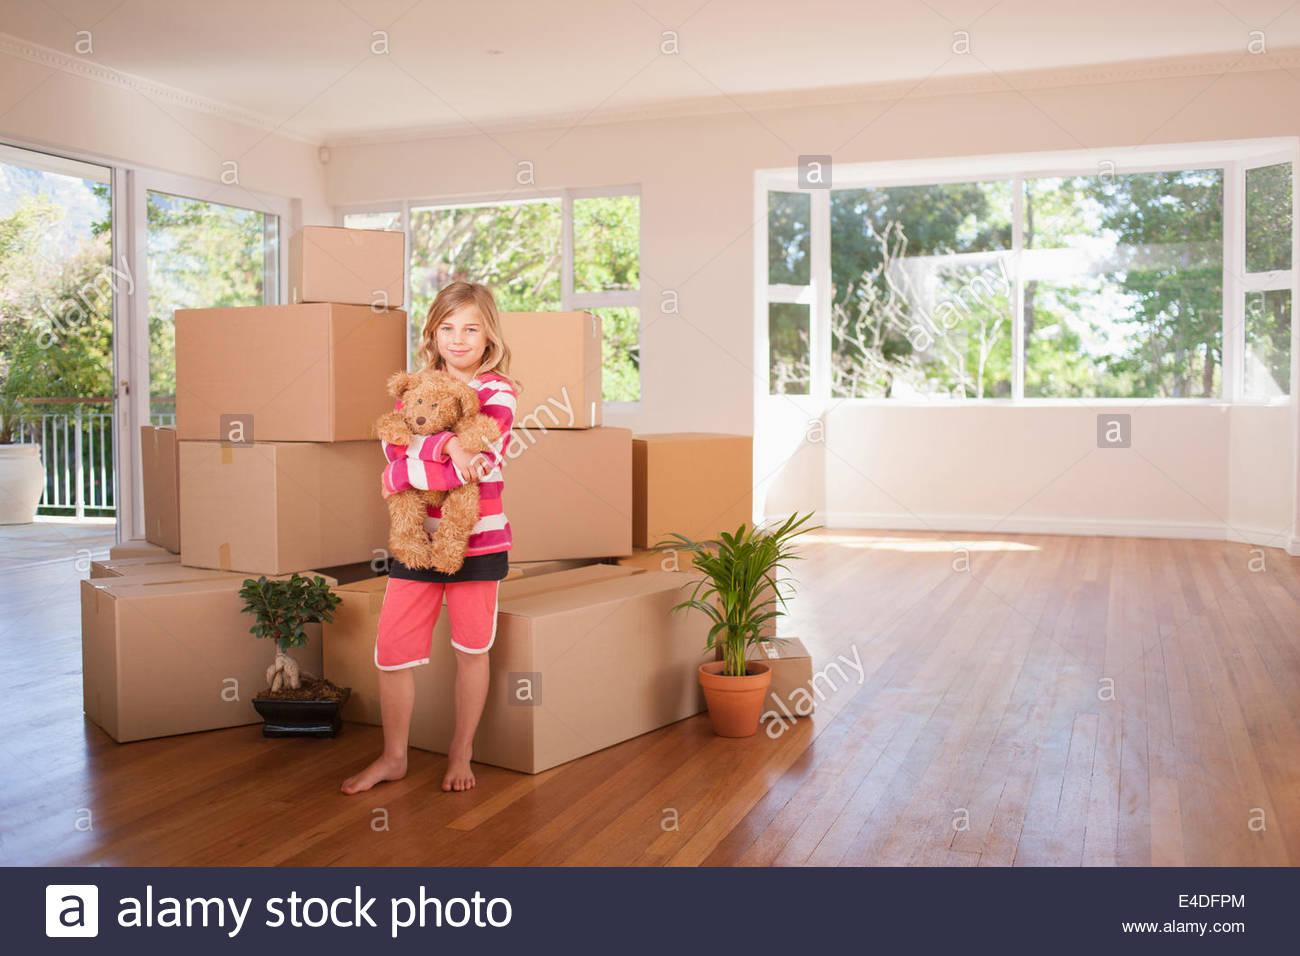 Girl hugging teddy bear in new house - Stock Image